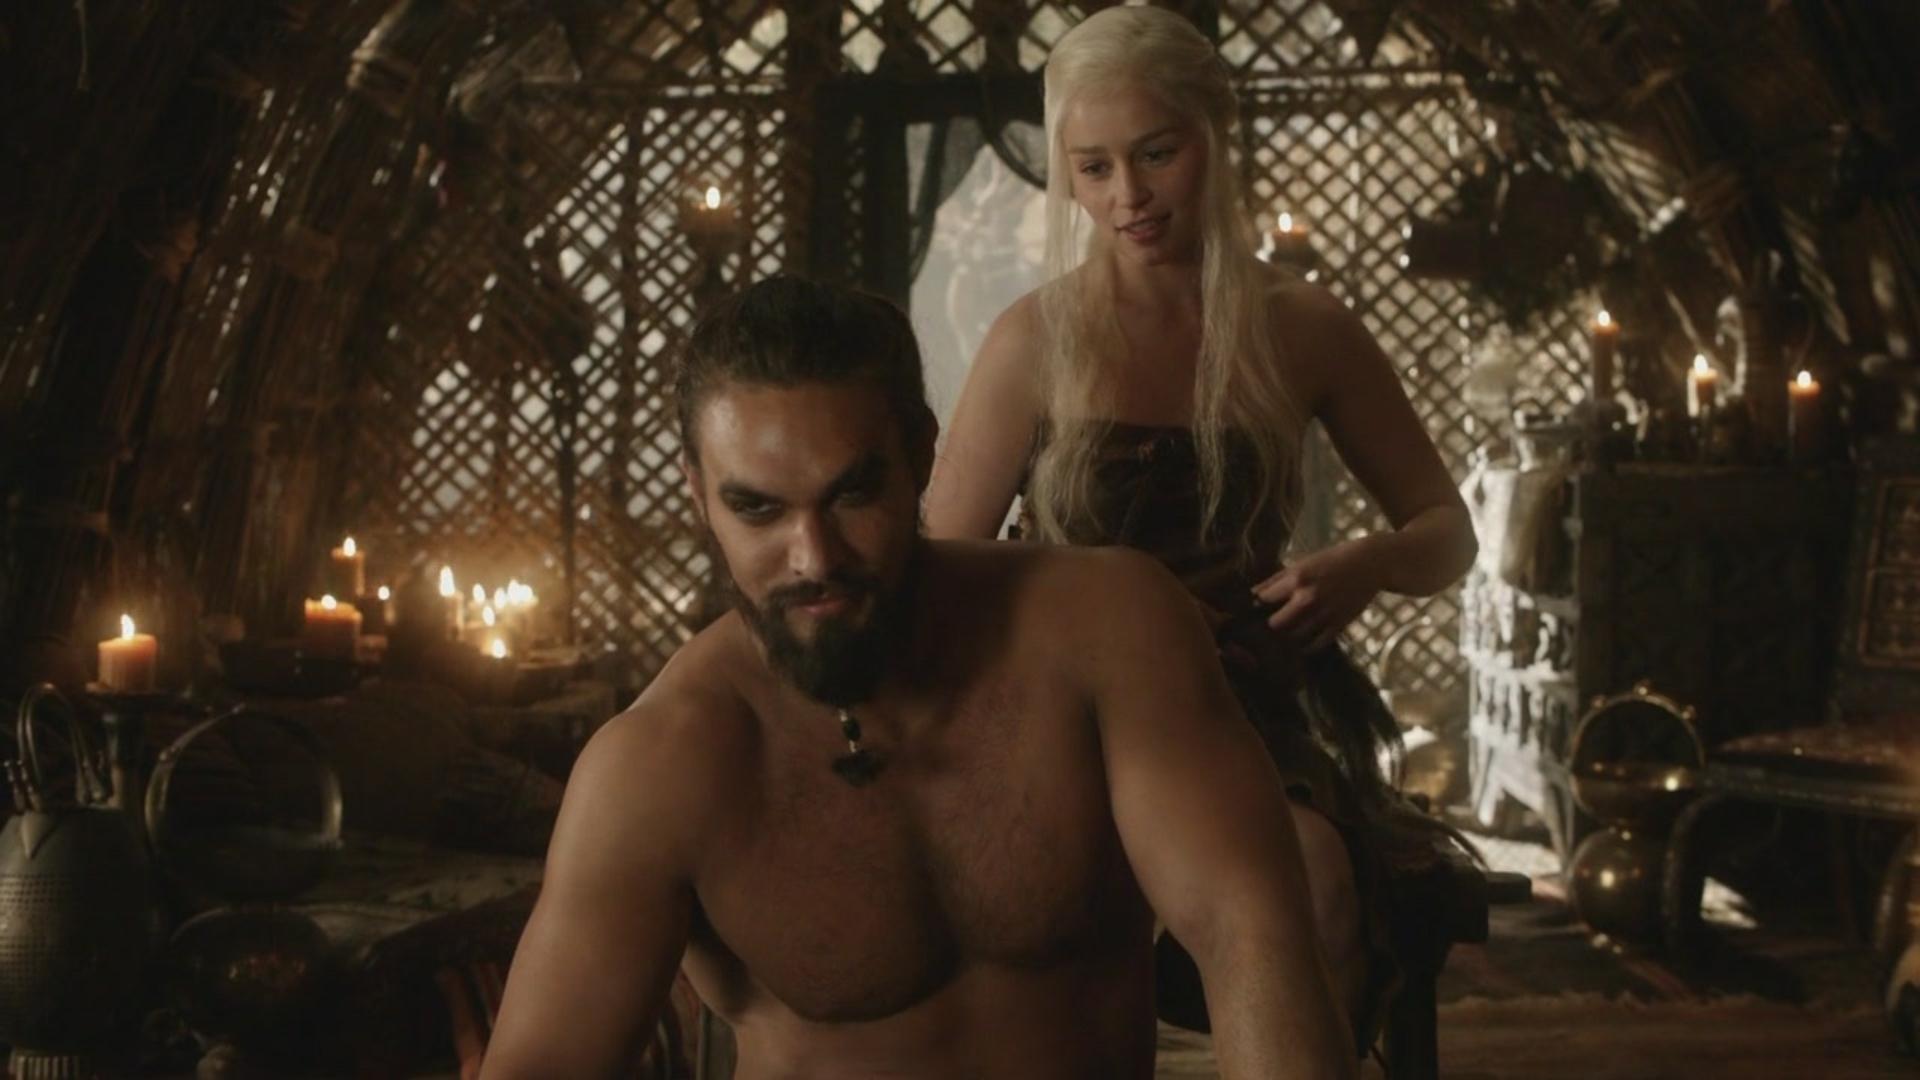 Game Of Thrones Sex Sceens photo 28